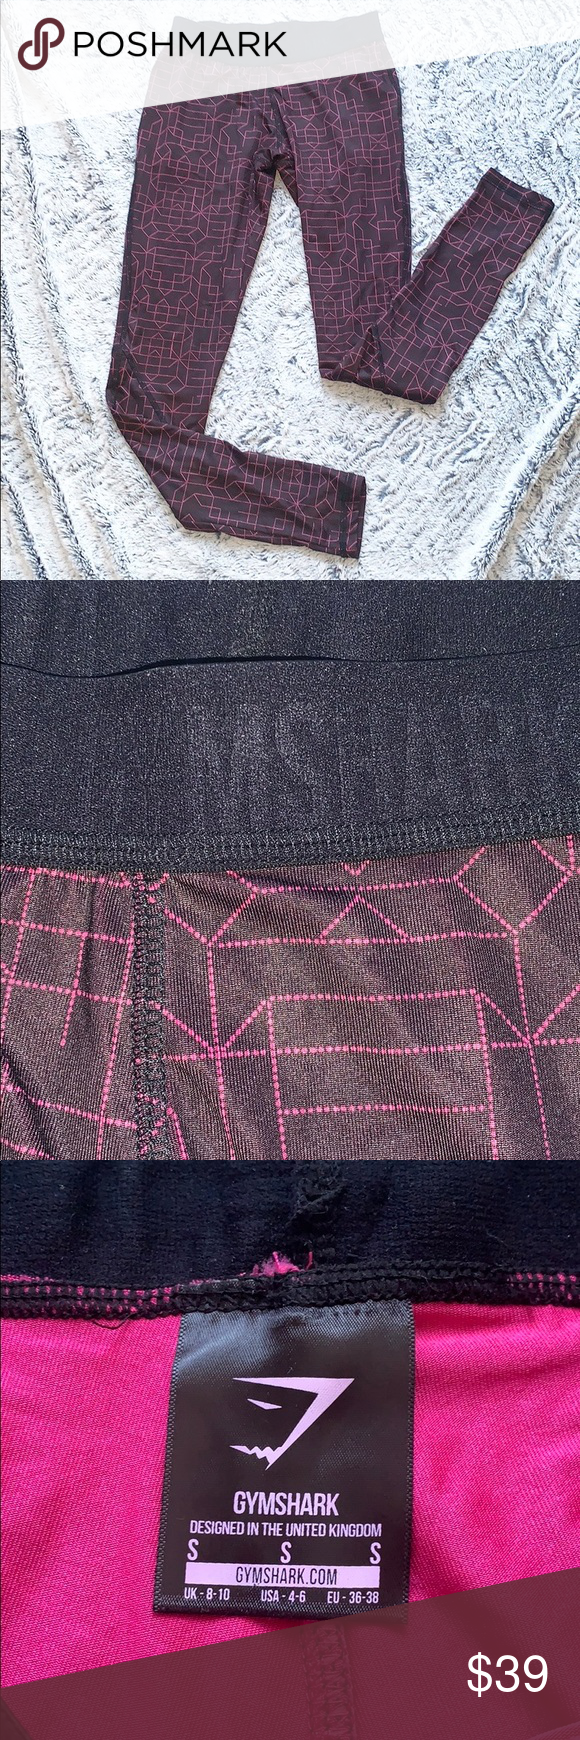 Gym Shark Dark Purple Legging Pink Design Gym Shark Size Small Dark Purple with ..., #Dark #Design #...